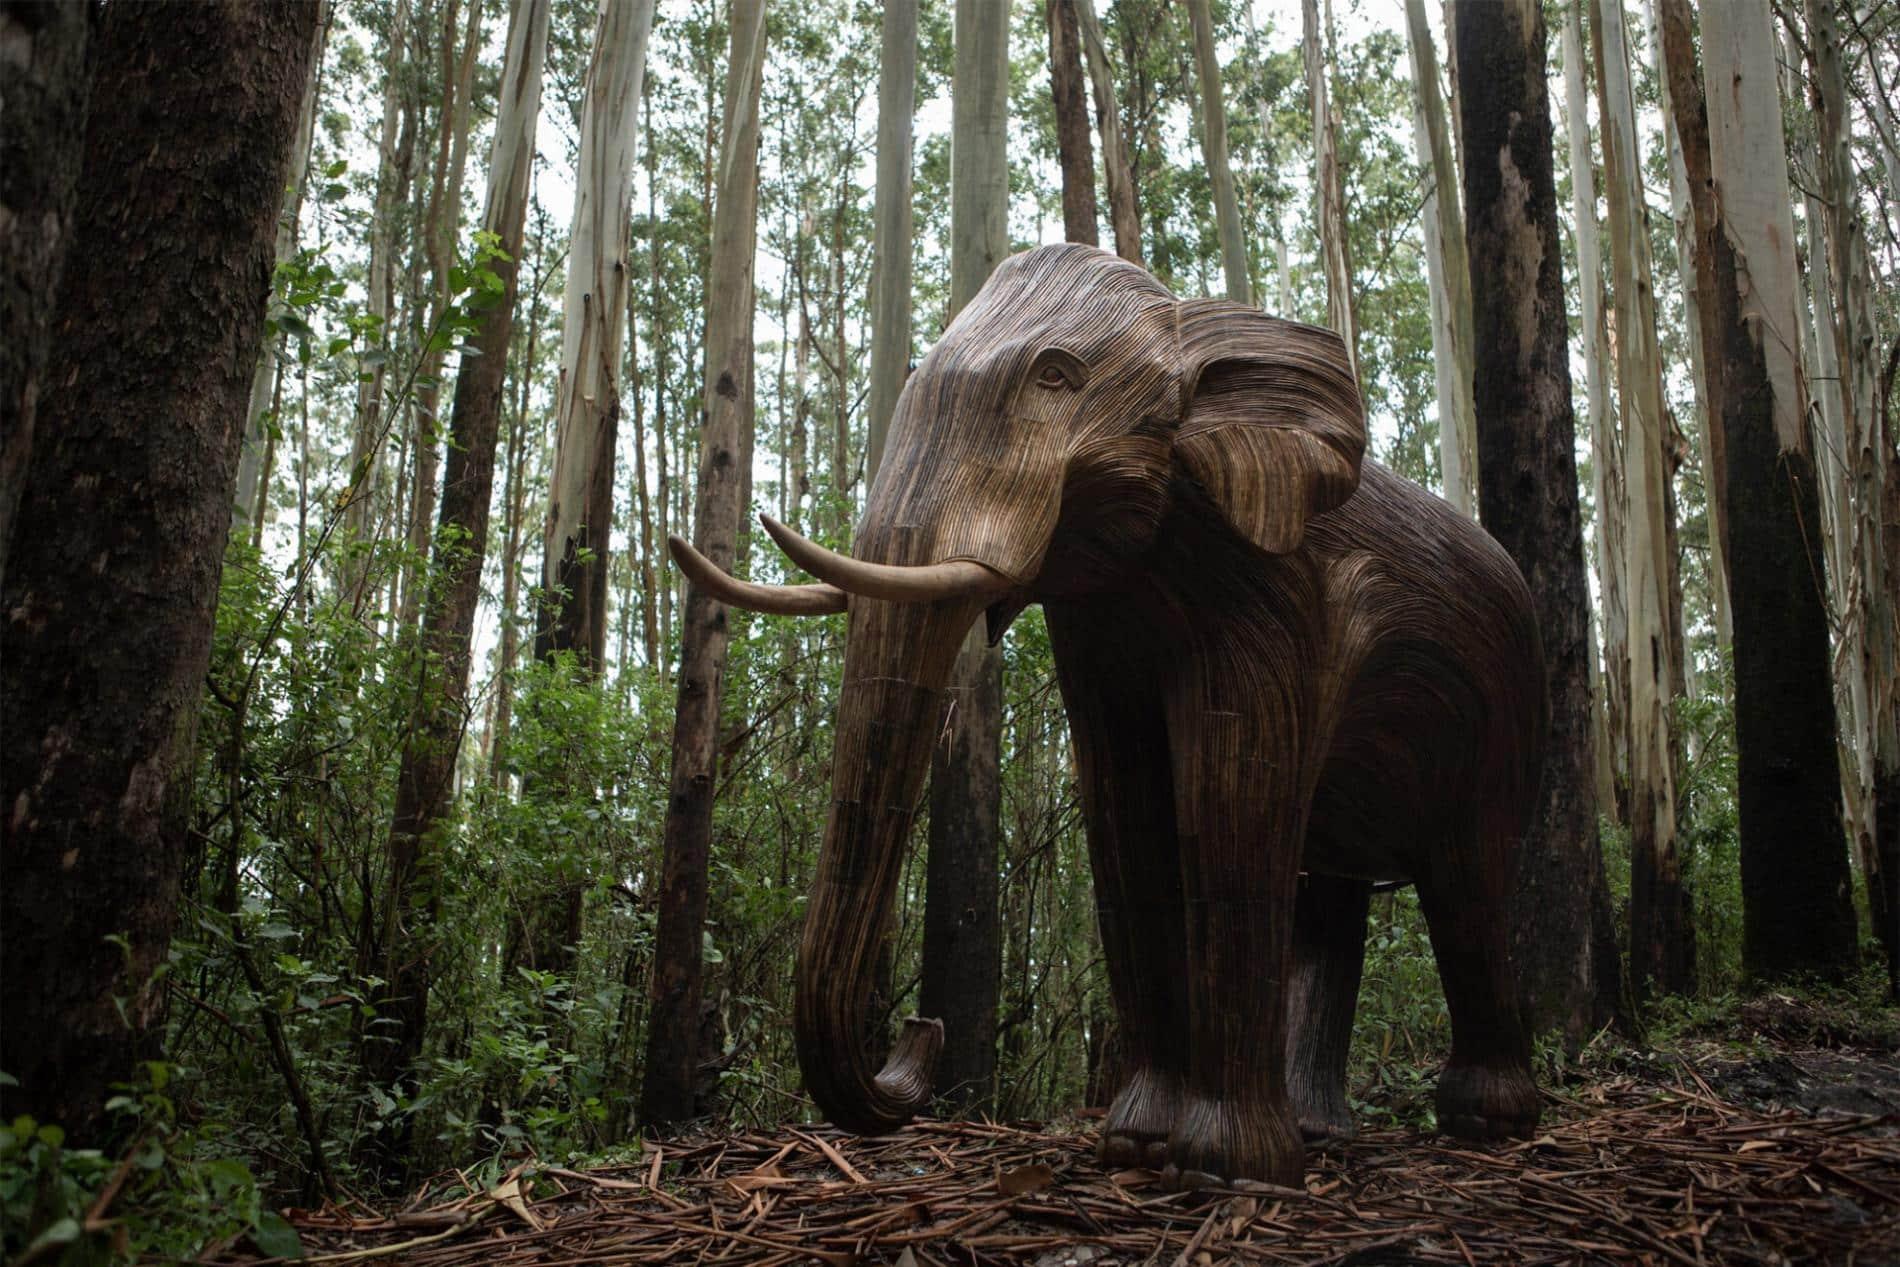 elephant escultura manada bosque